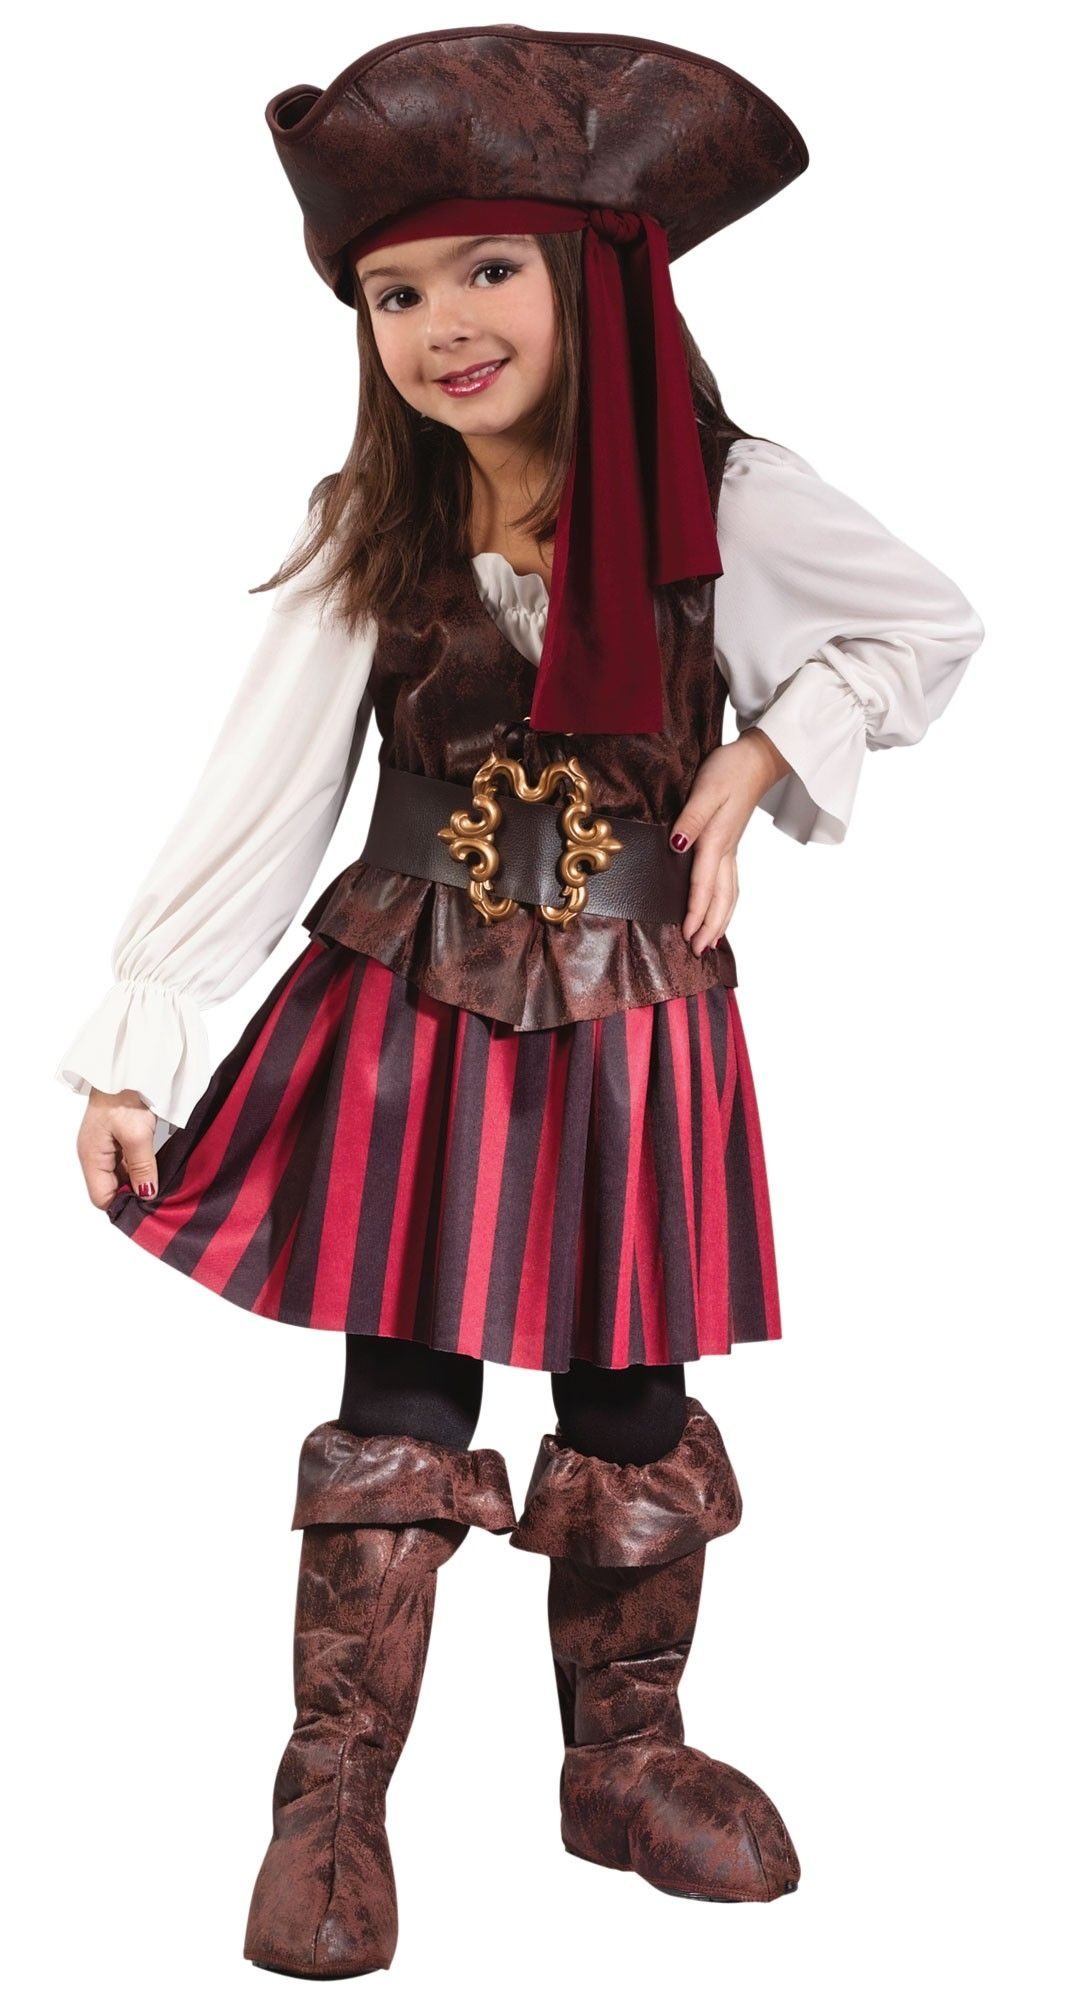 Пиратский костюм для девочки